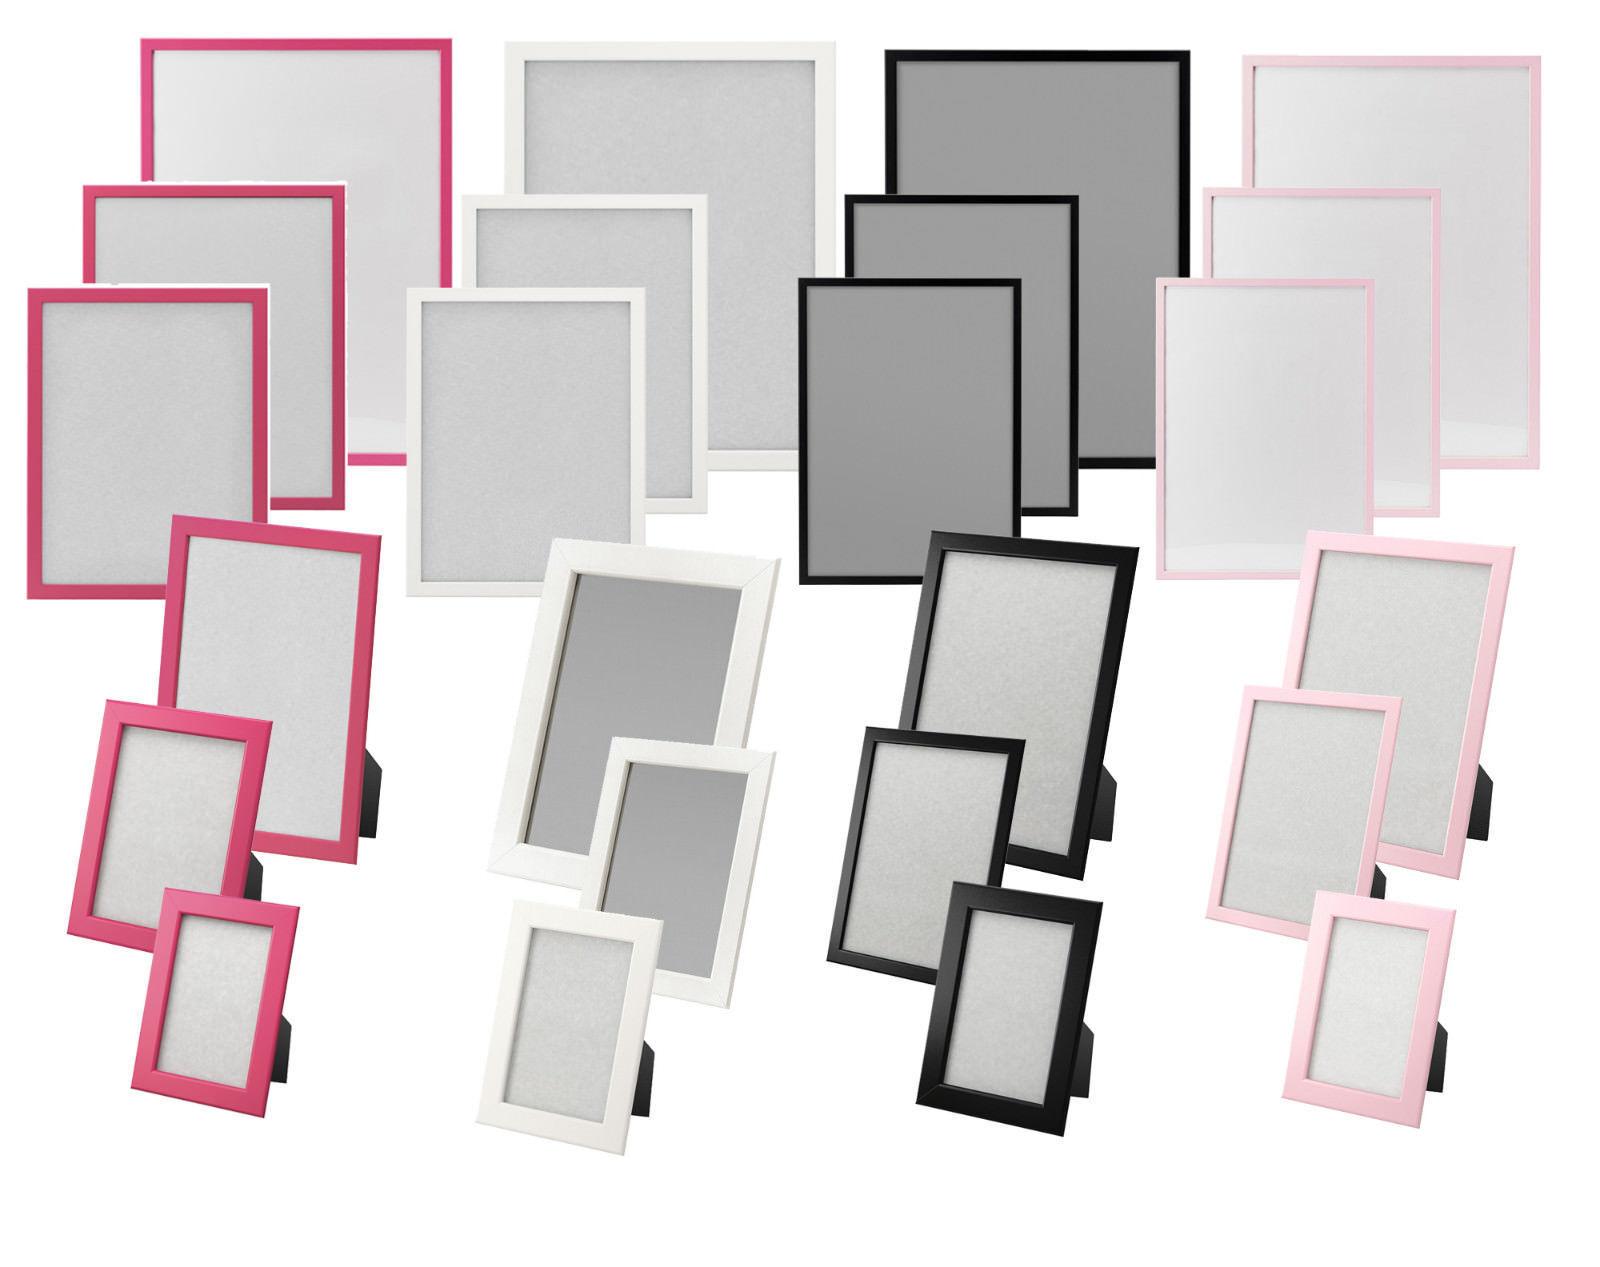 IKEA FISKBO Bilderrahmen In 4 Verschiedenen Farben Und 6 Grossen